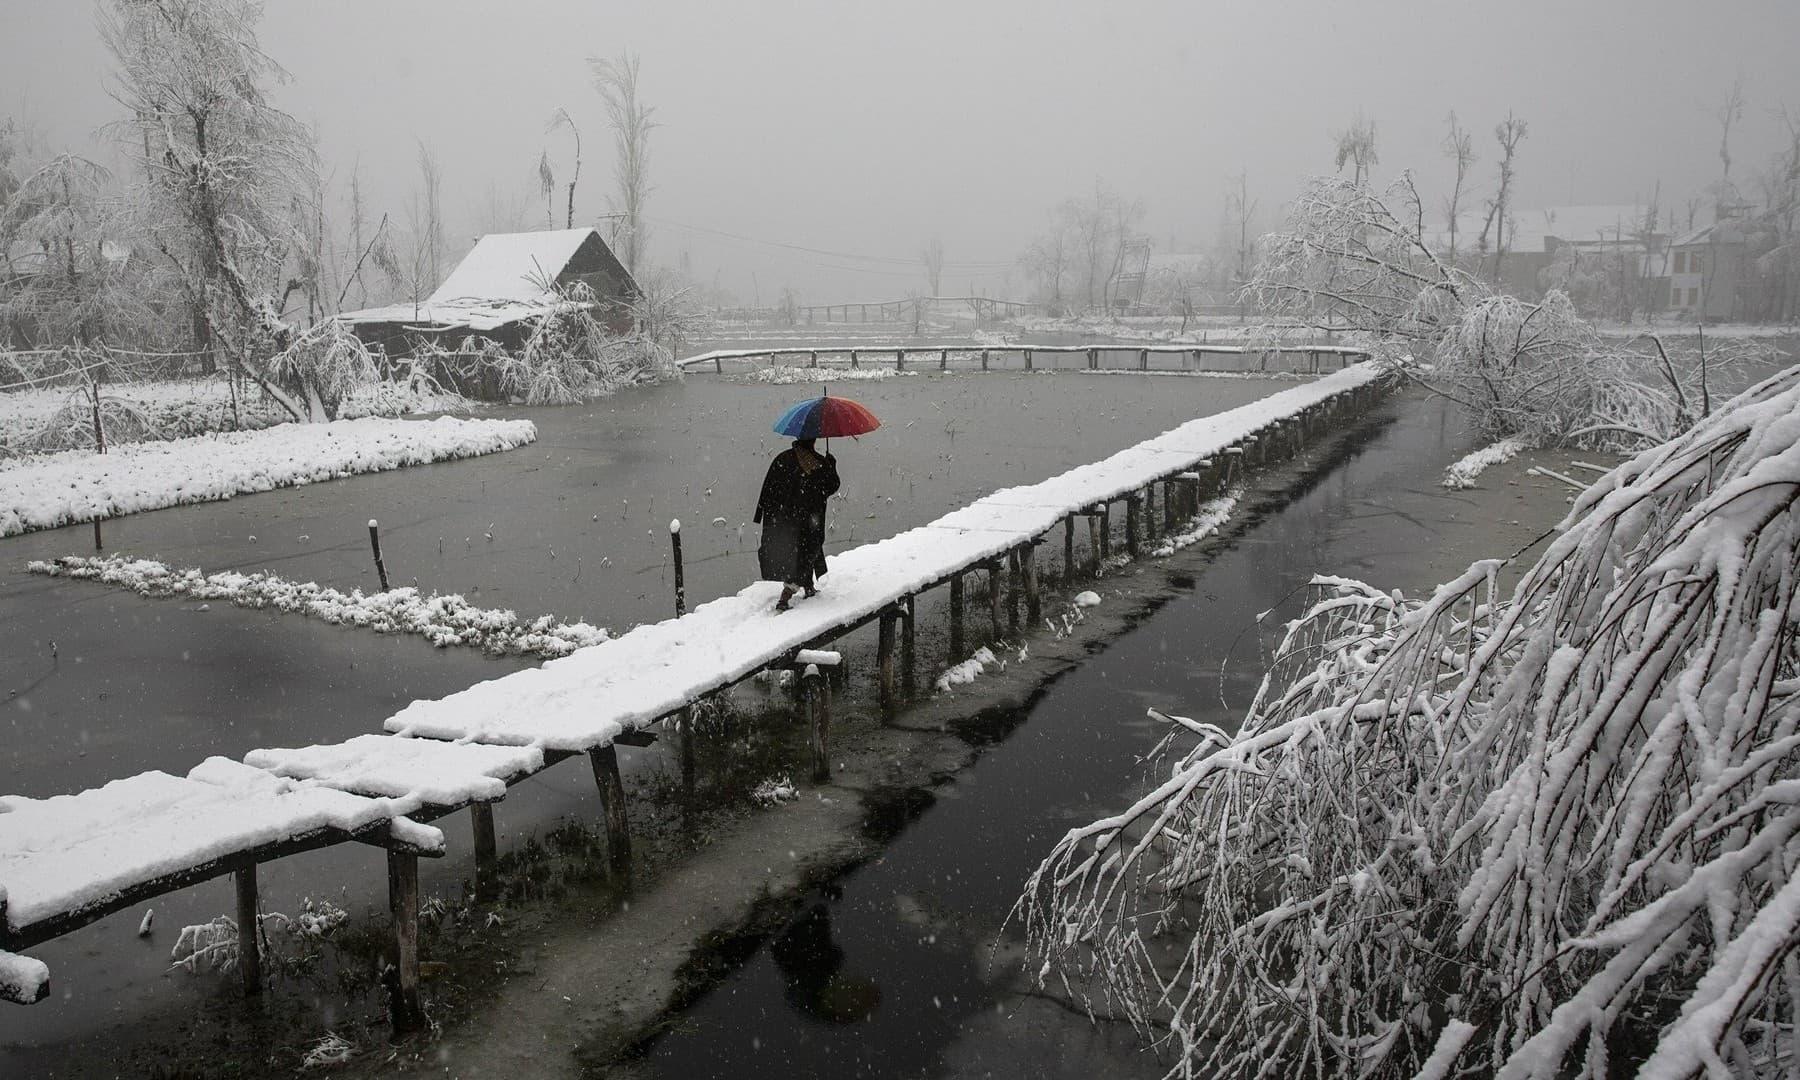 A Kashmiri man walks on a snow covered footbridge as it snows in the interiors of Dal Lake in Srinagar on December 13, 2019. — AP/Dar Yasin